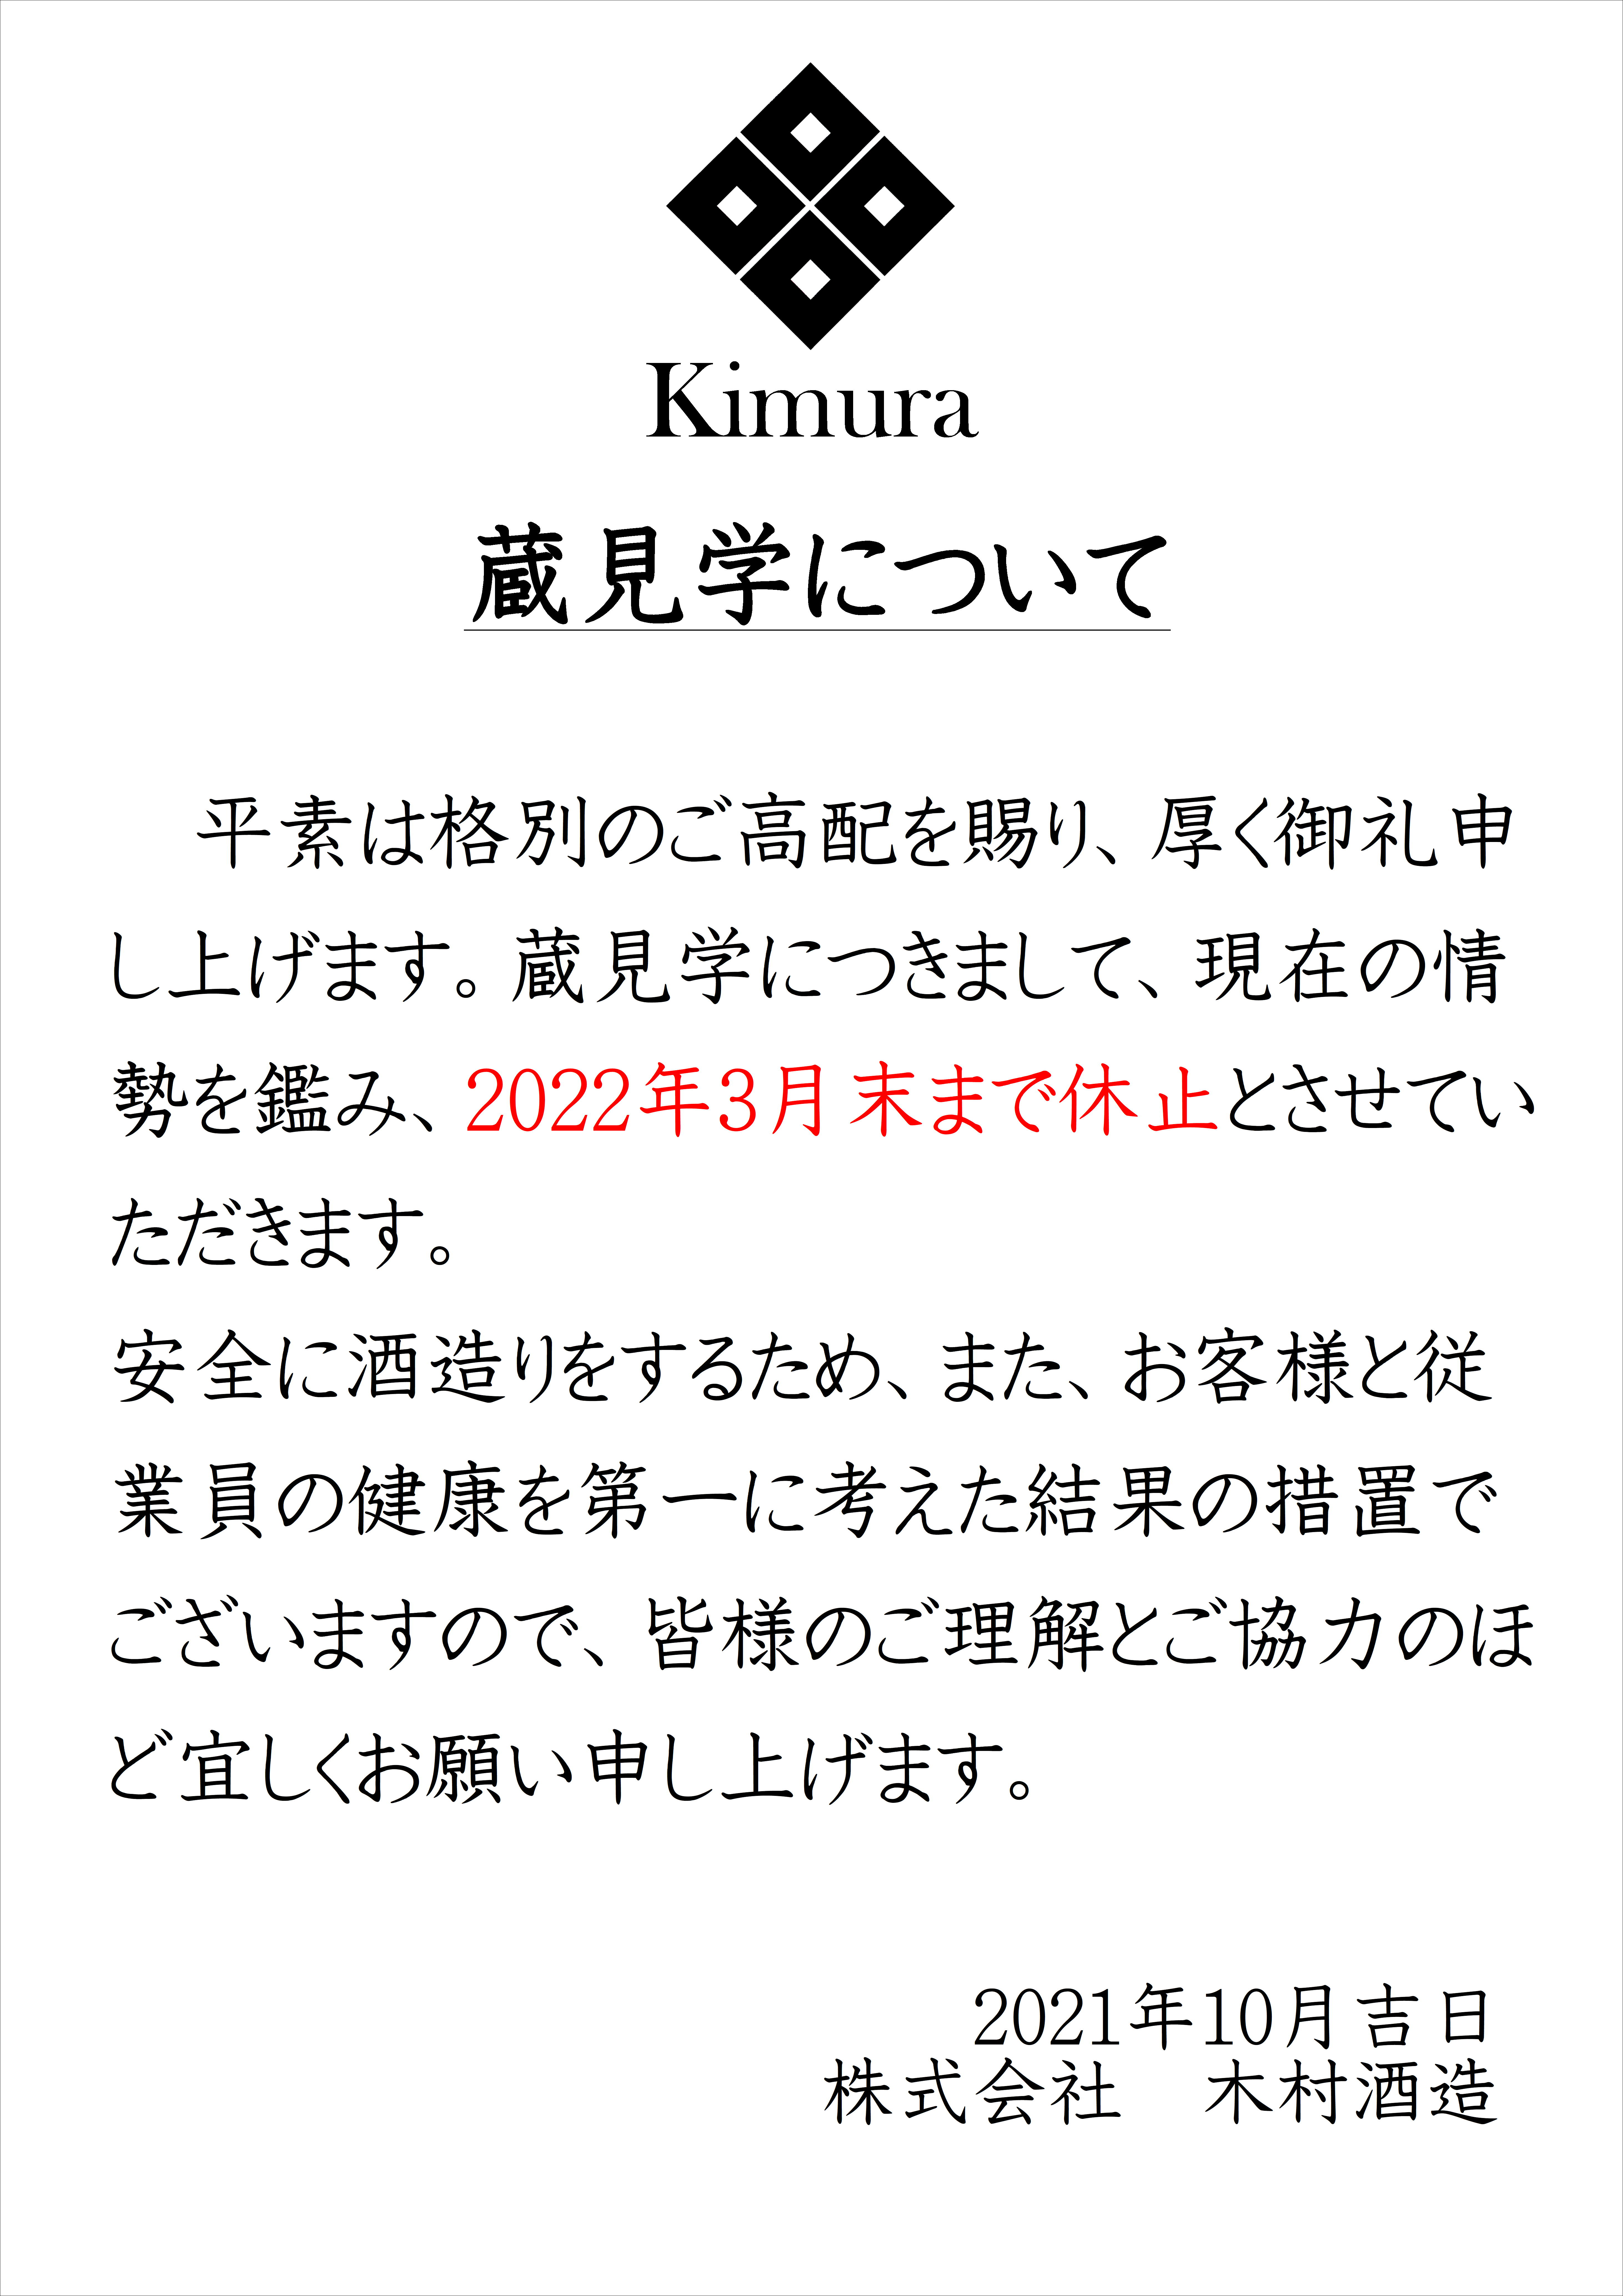 http://www.fukukomachi.com/blog/photo/20211014.JPG